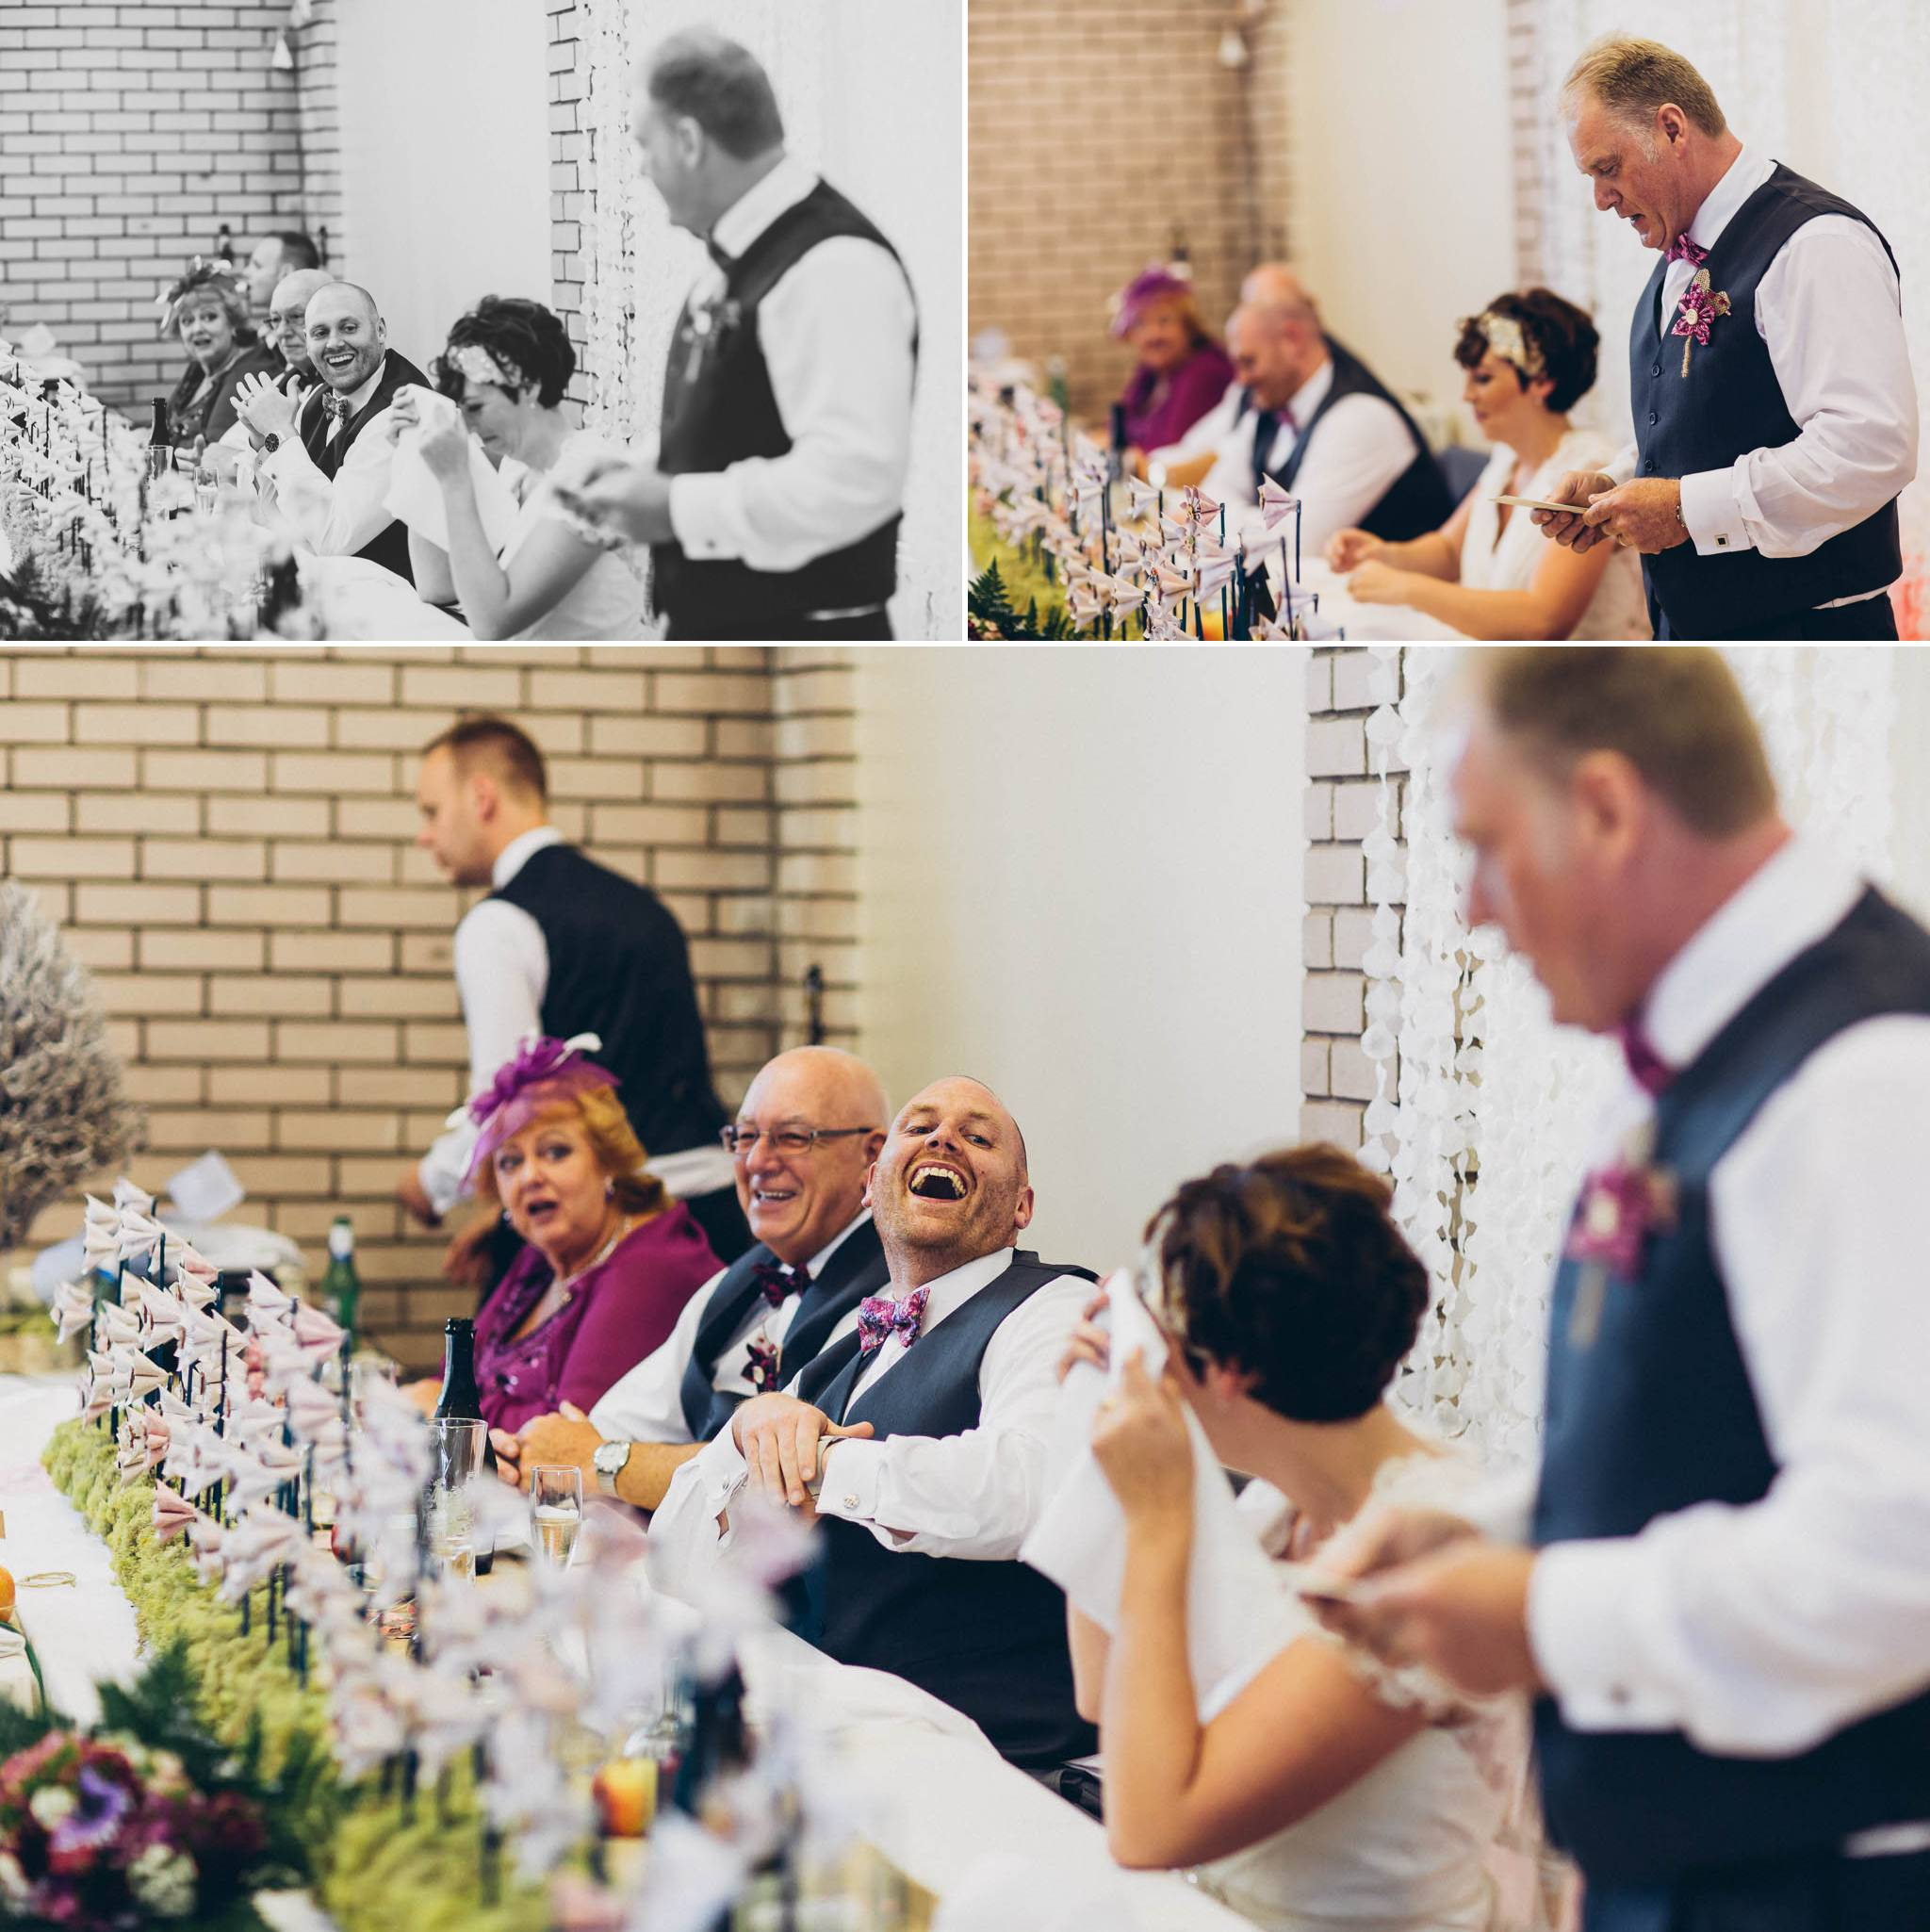 staffordshire-wedding-photographer 16.jpg